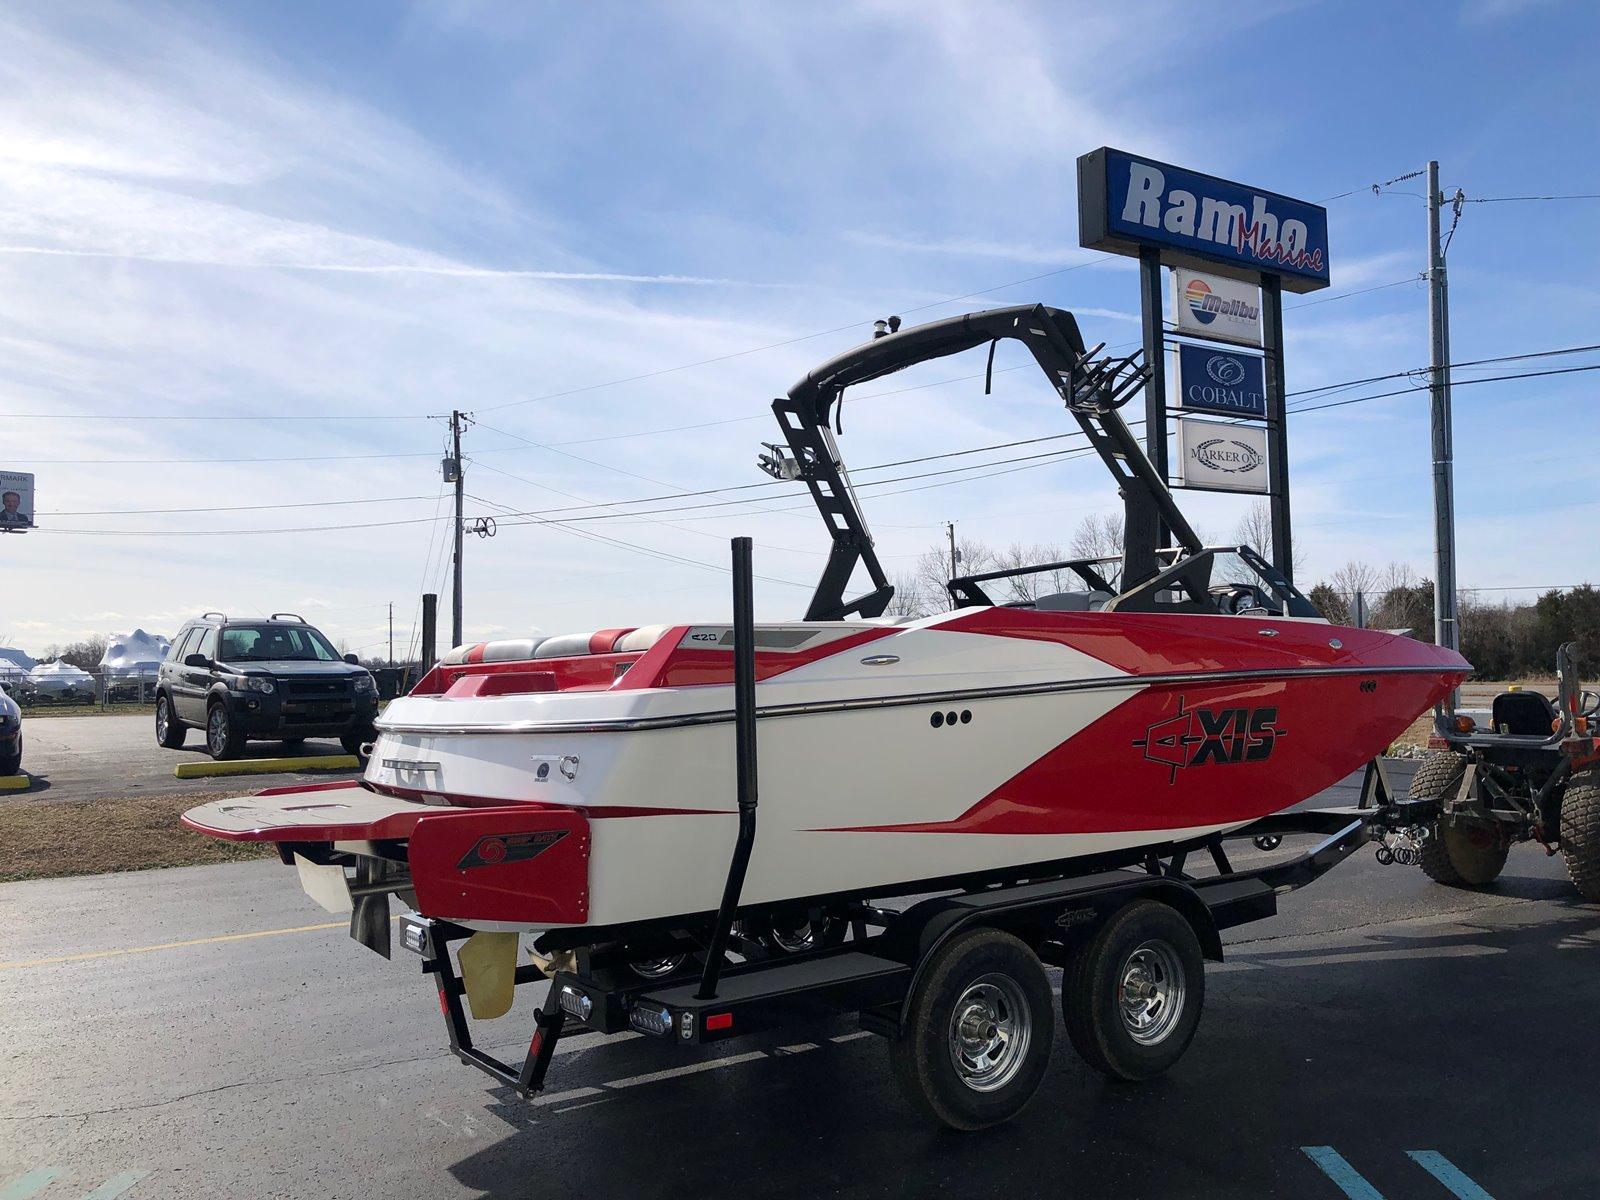 2019 AXIS A20 - Rambo Marine - Huntsville - N33639 - Rambo